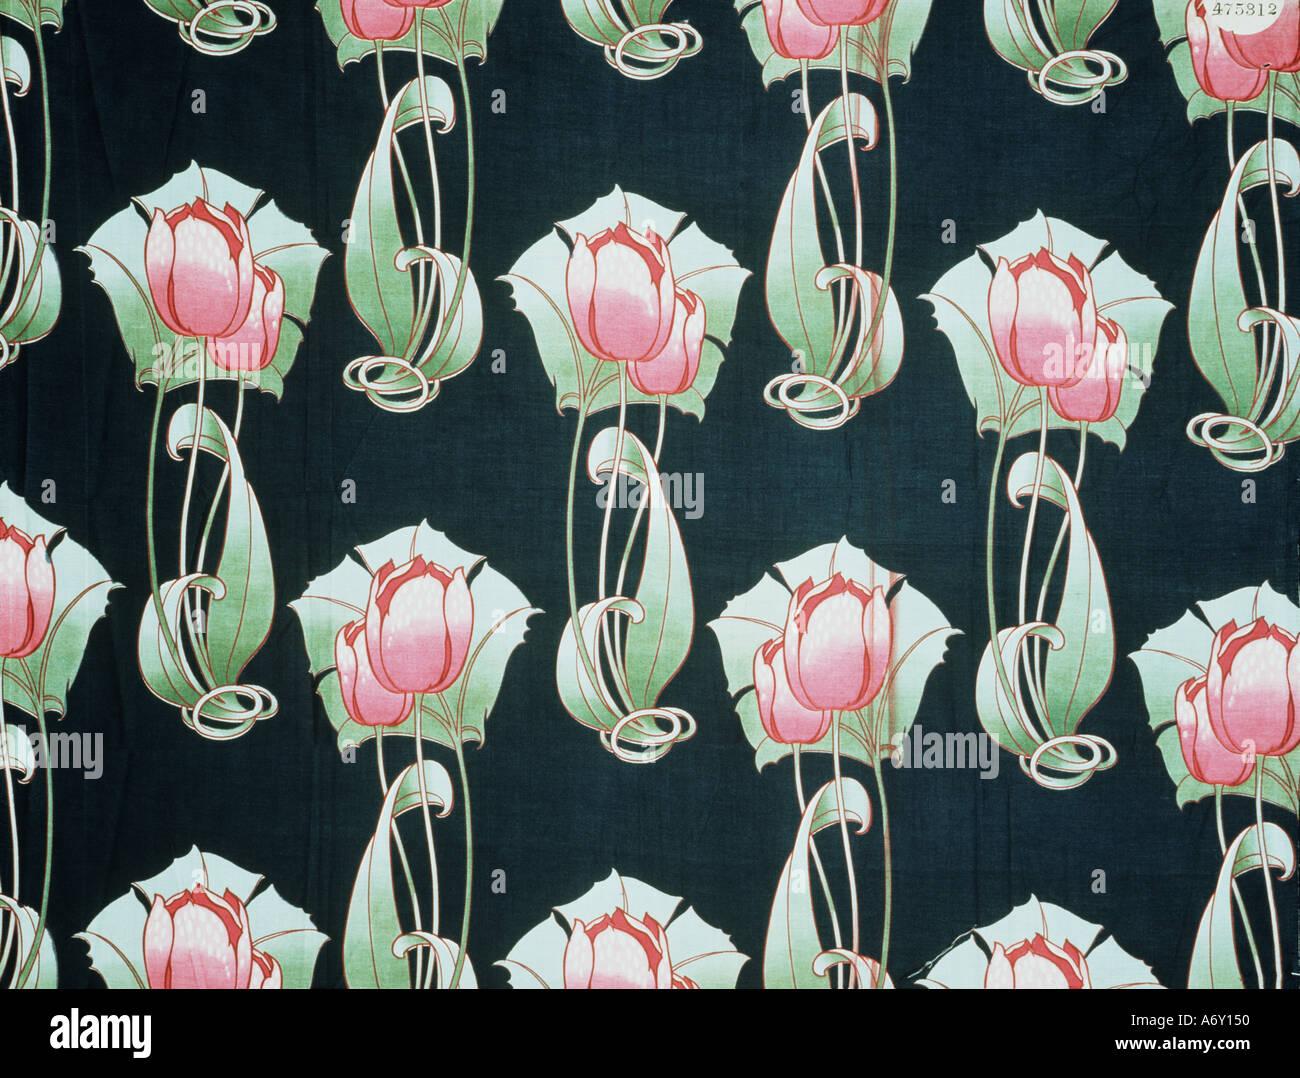 Tulip diseño de tela. Inglaterra, 1906. Imagen De Stock